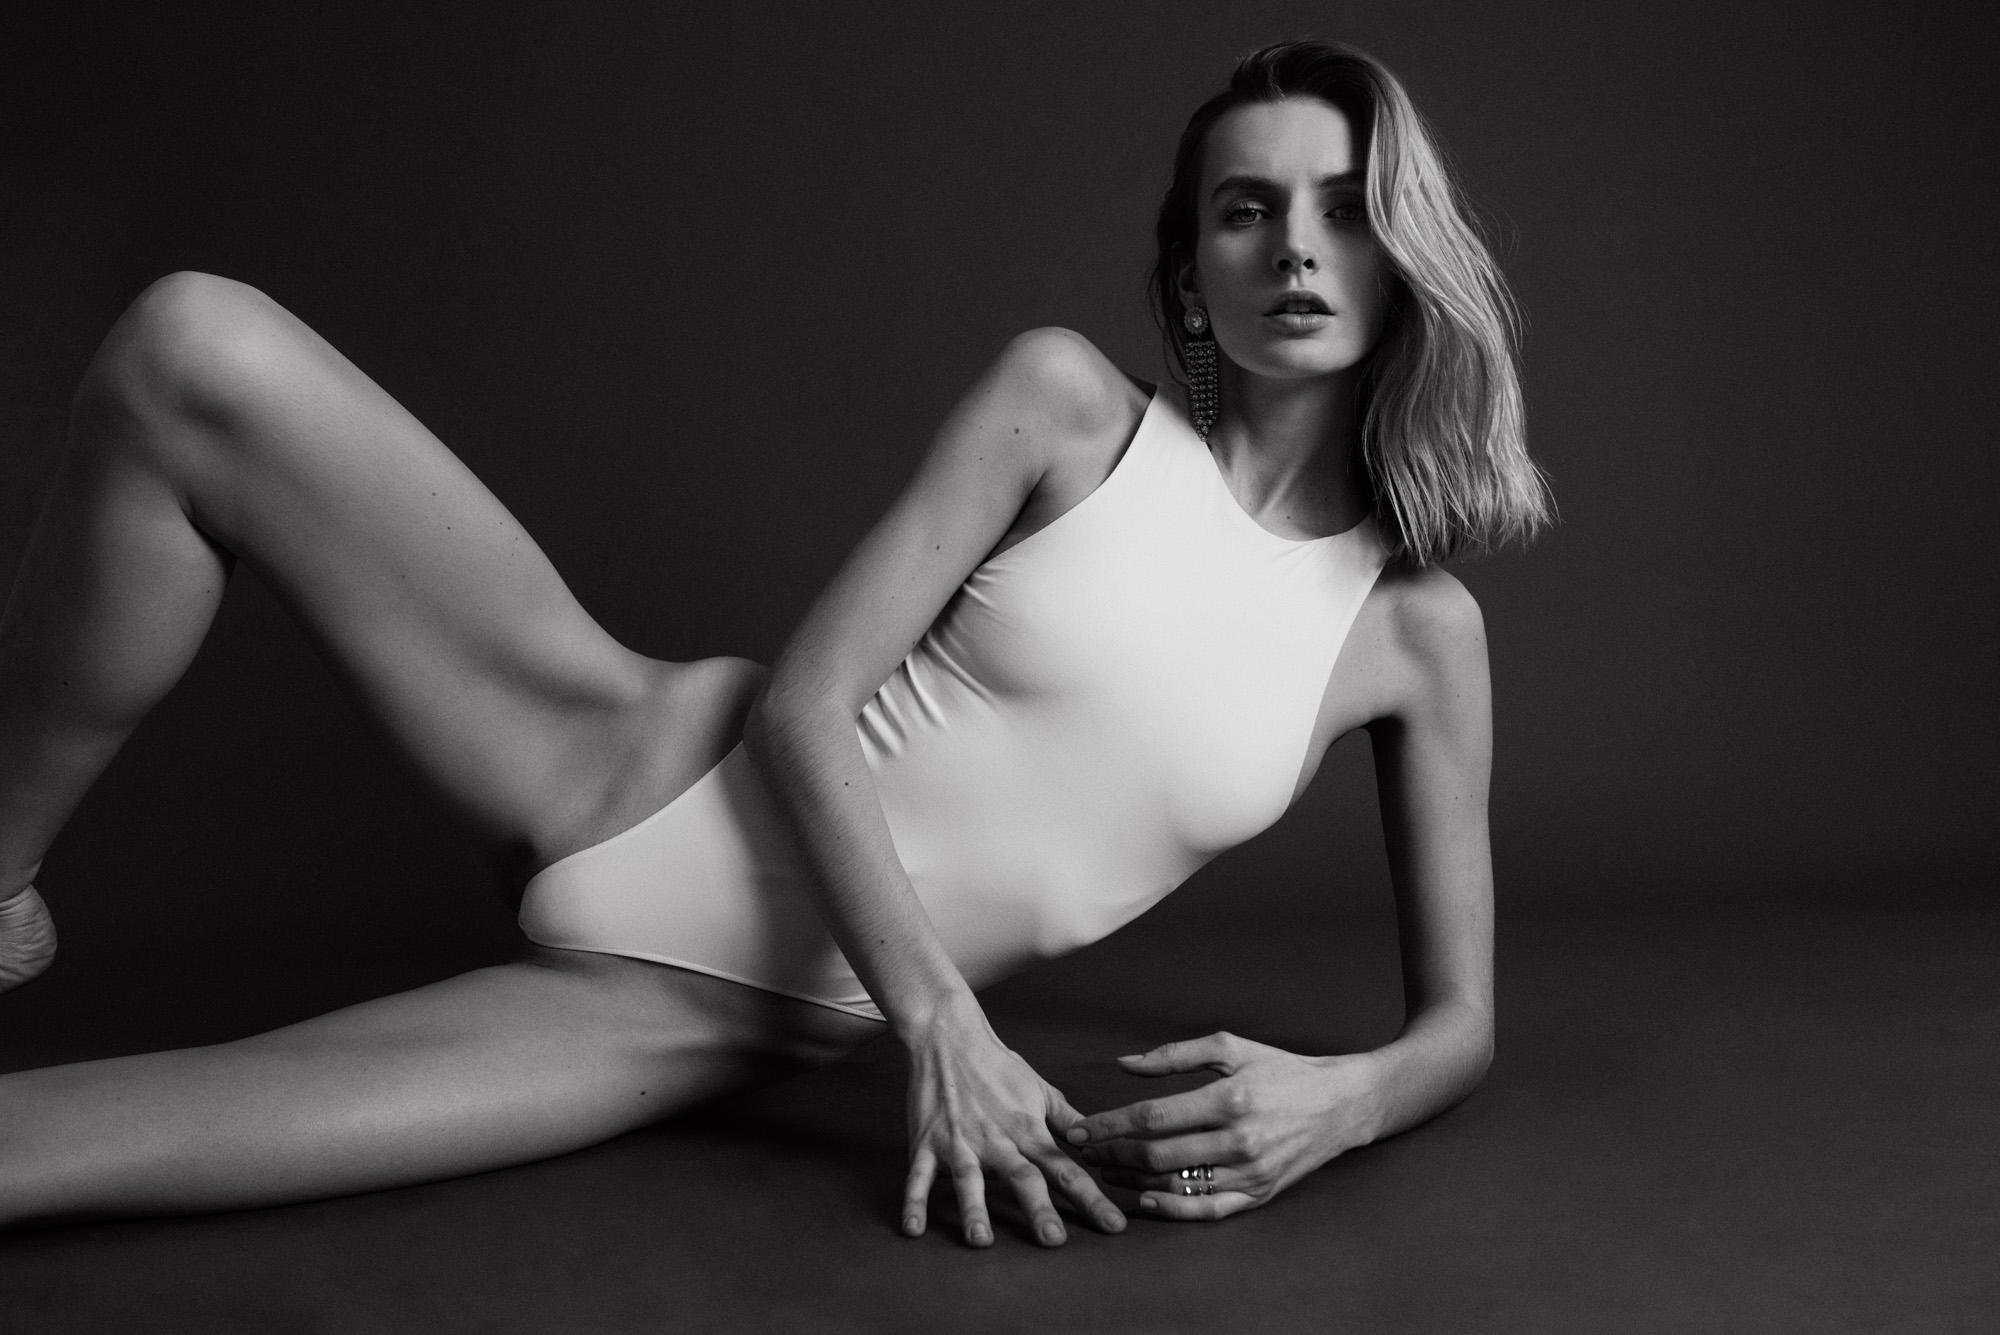 Marie nackt Lisa Bosbach  Maria Sharapova